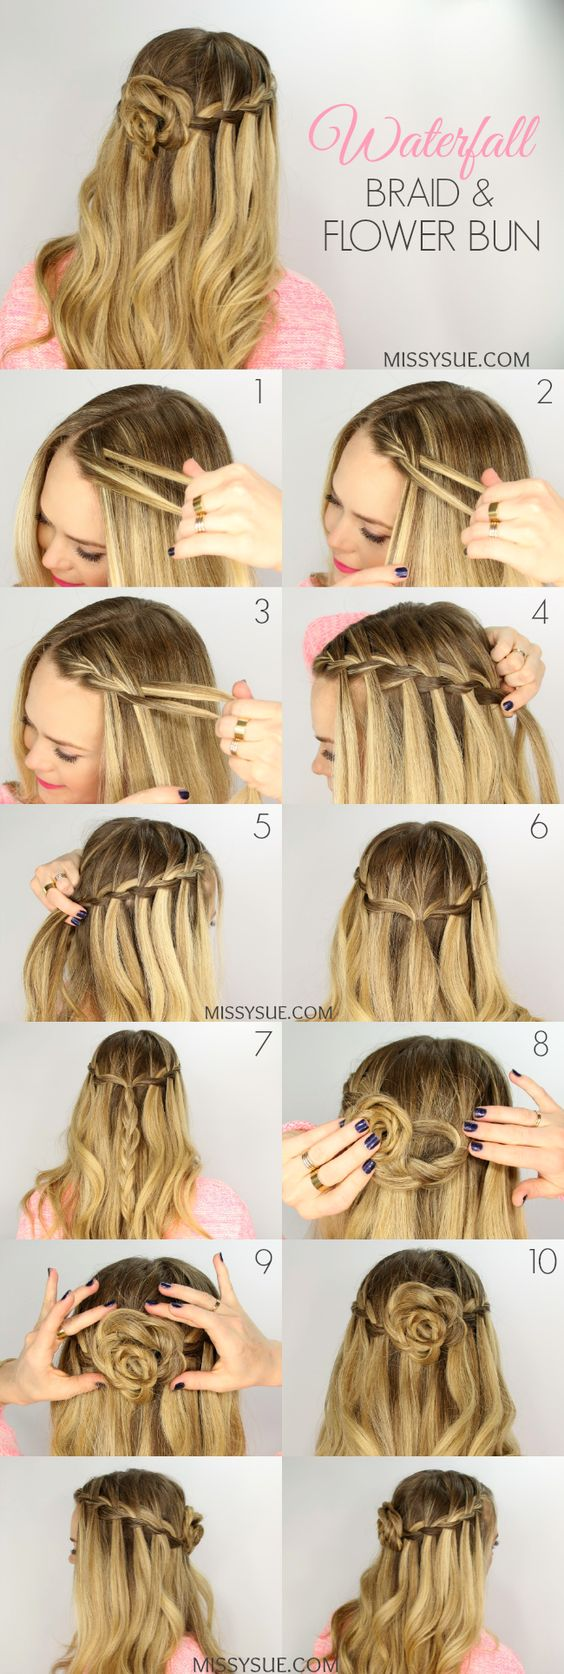 20 waterfall braid tutorials adding beautiful twists and